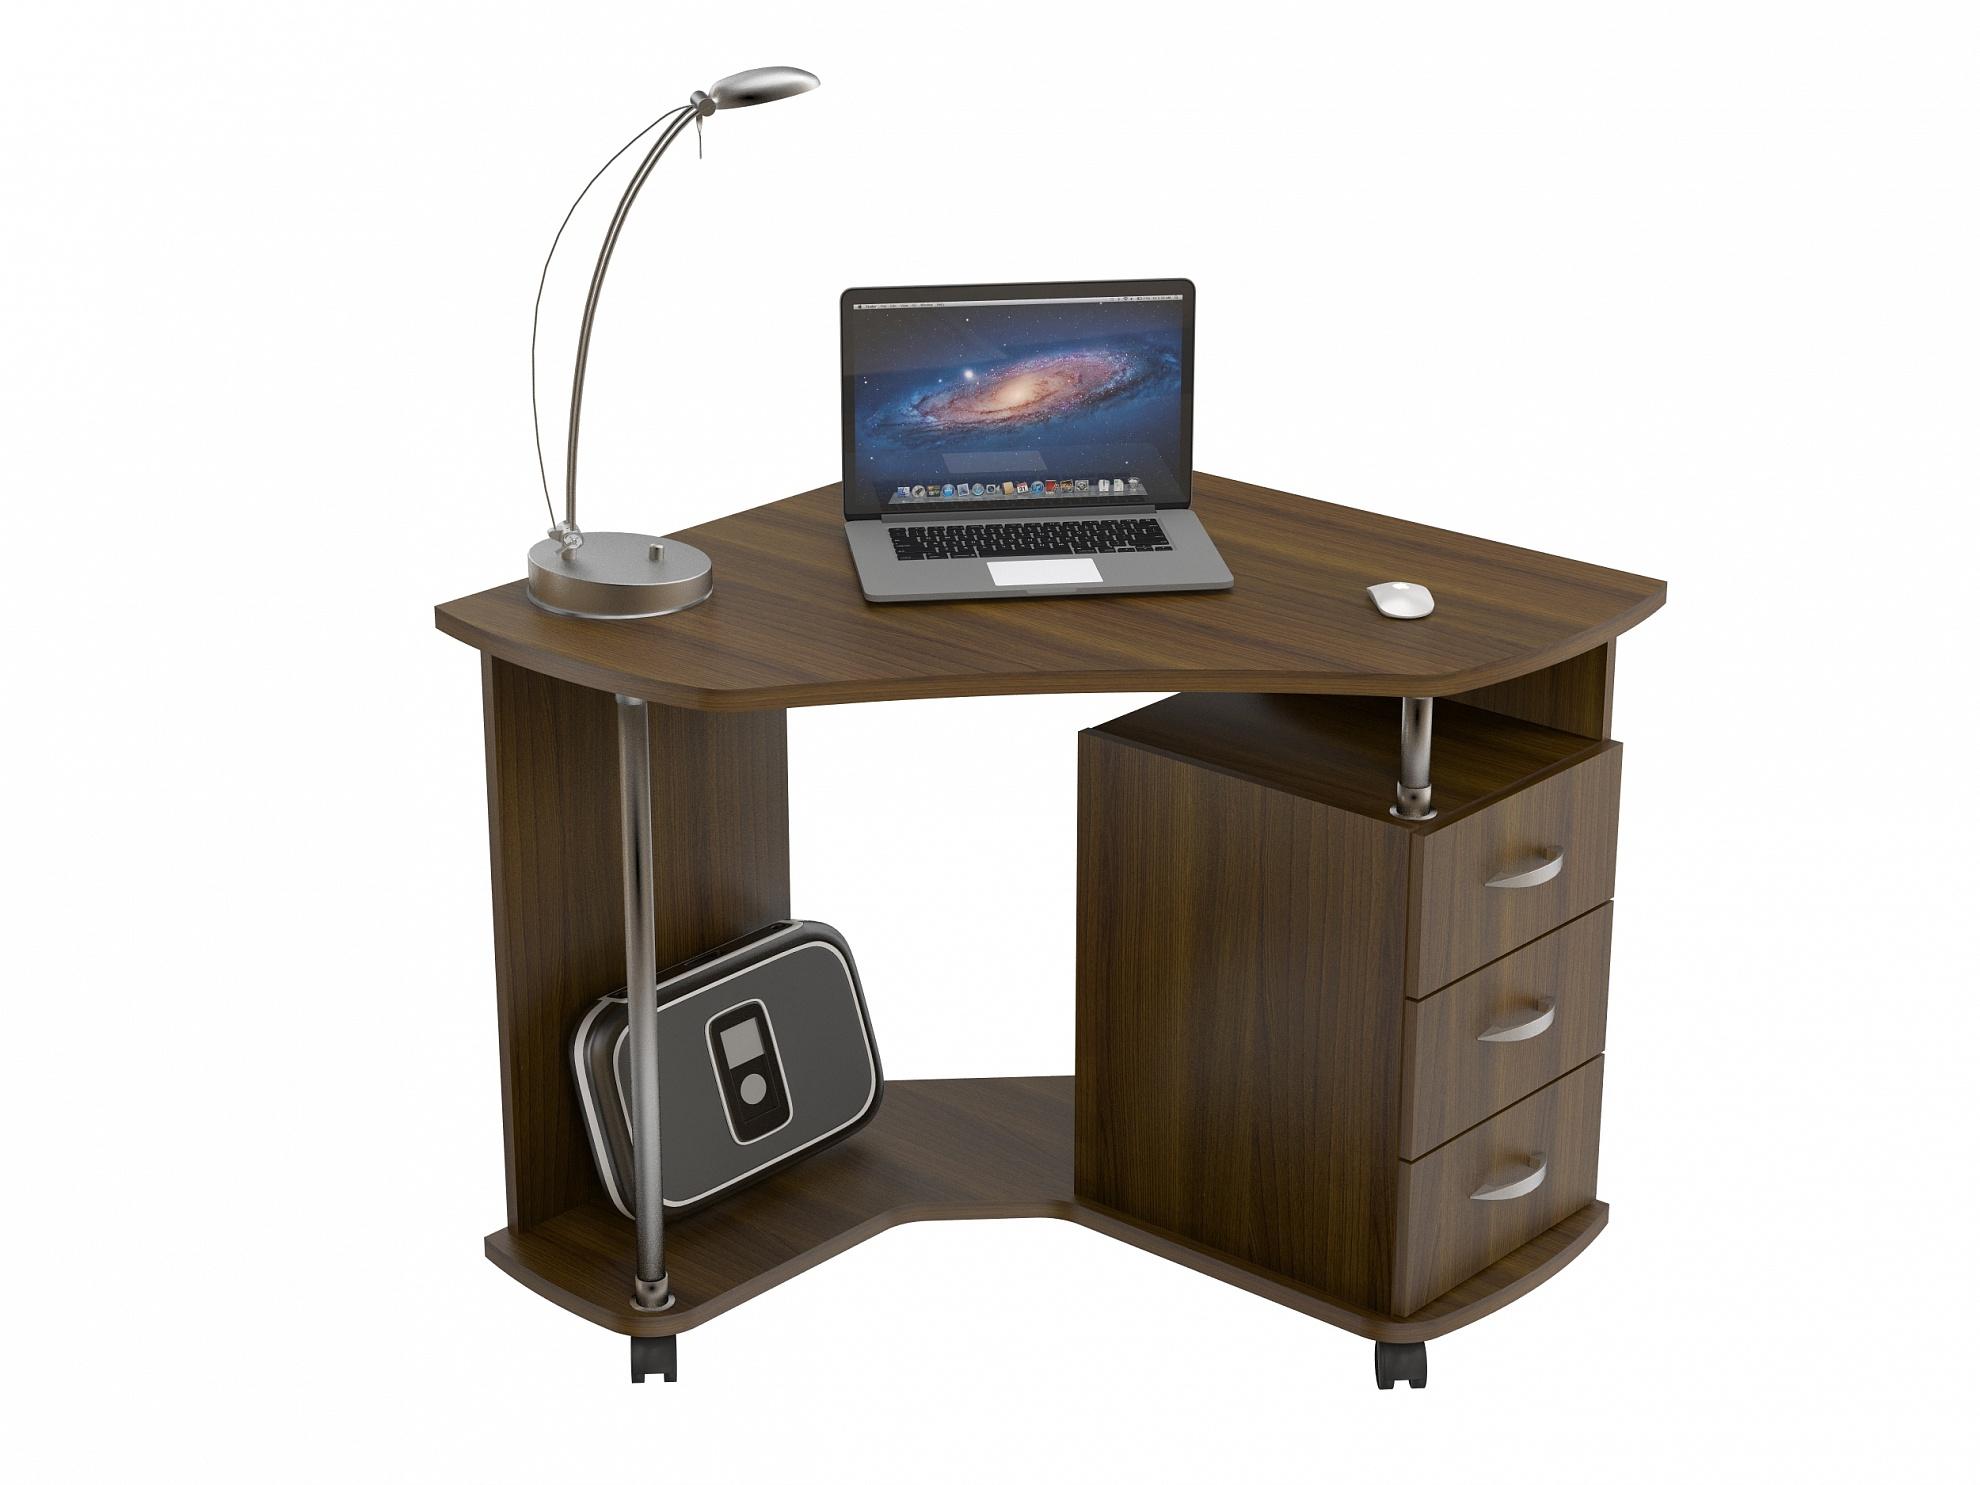 Компьютерный стол КС 20-25 компьютерный стол кс 20 16м3